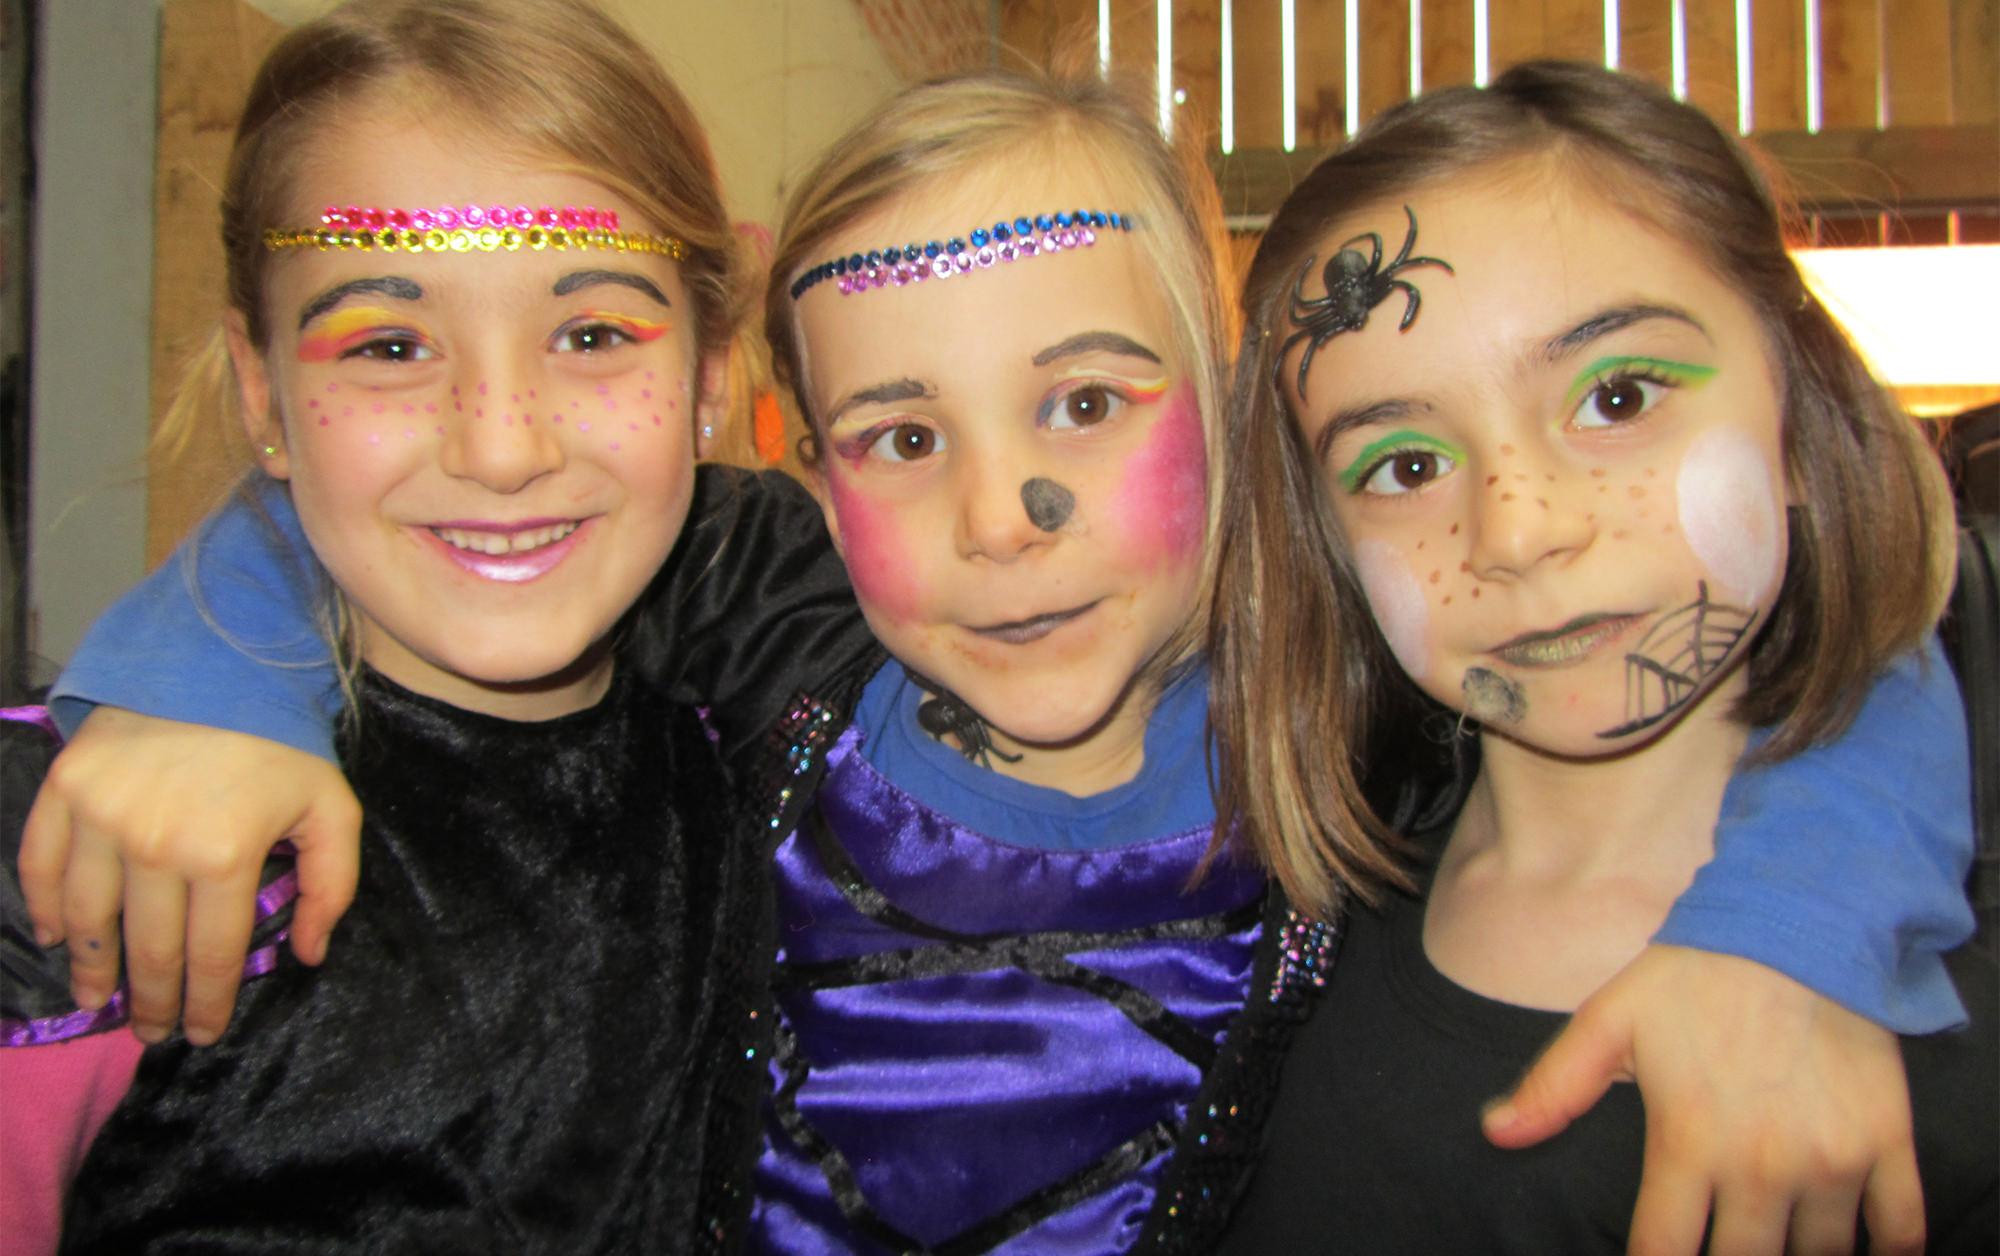 "<i class=""fa fa-child""></i> 27-31/10/2014 – Kinderkamp Herfstvakantie"